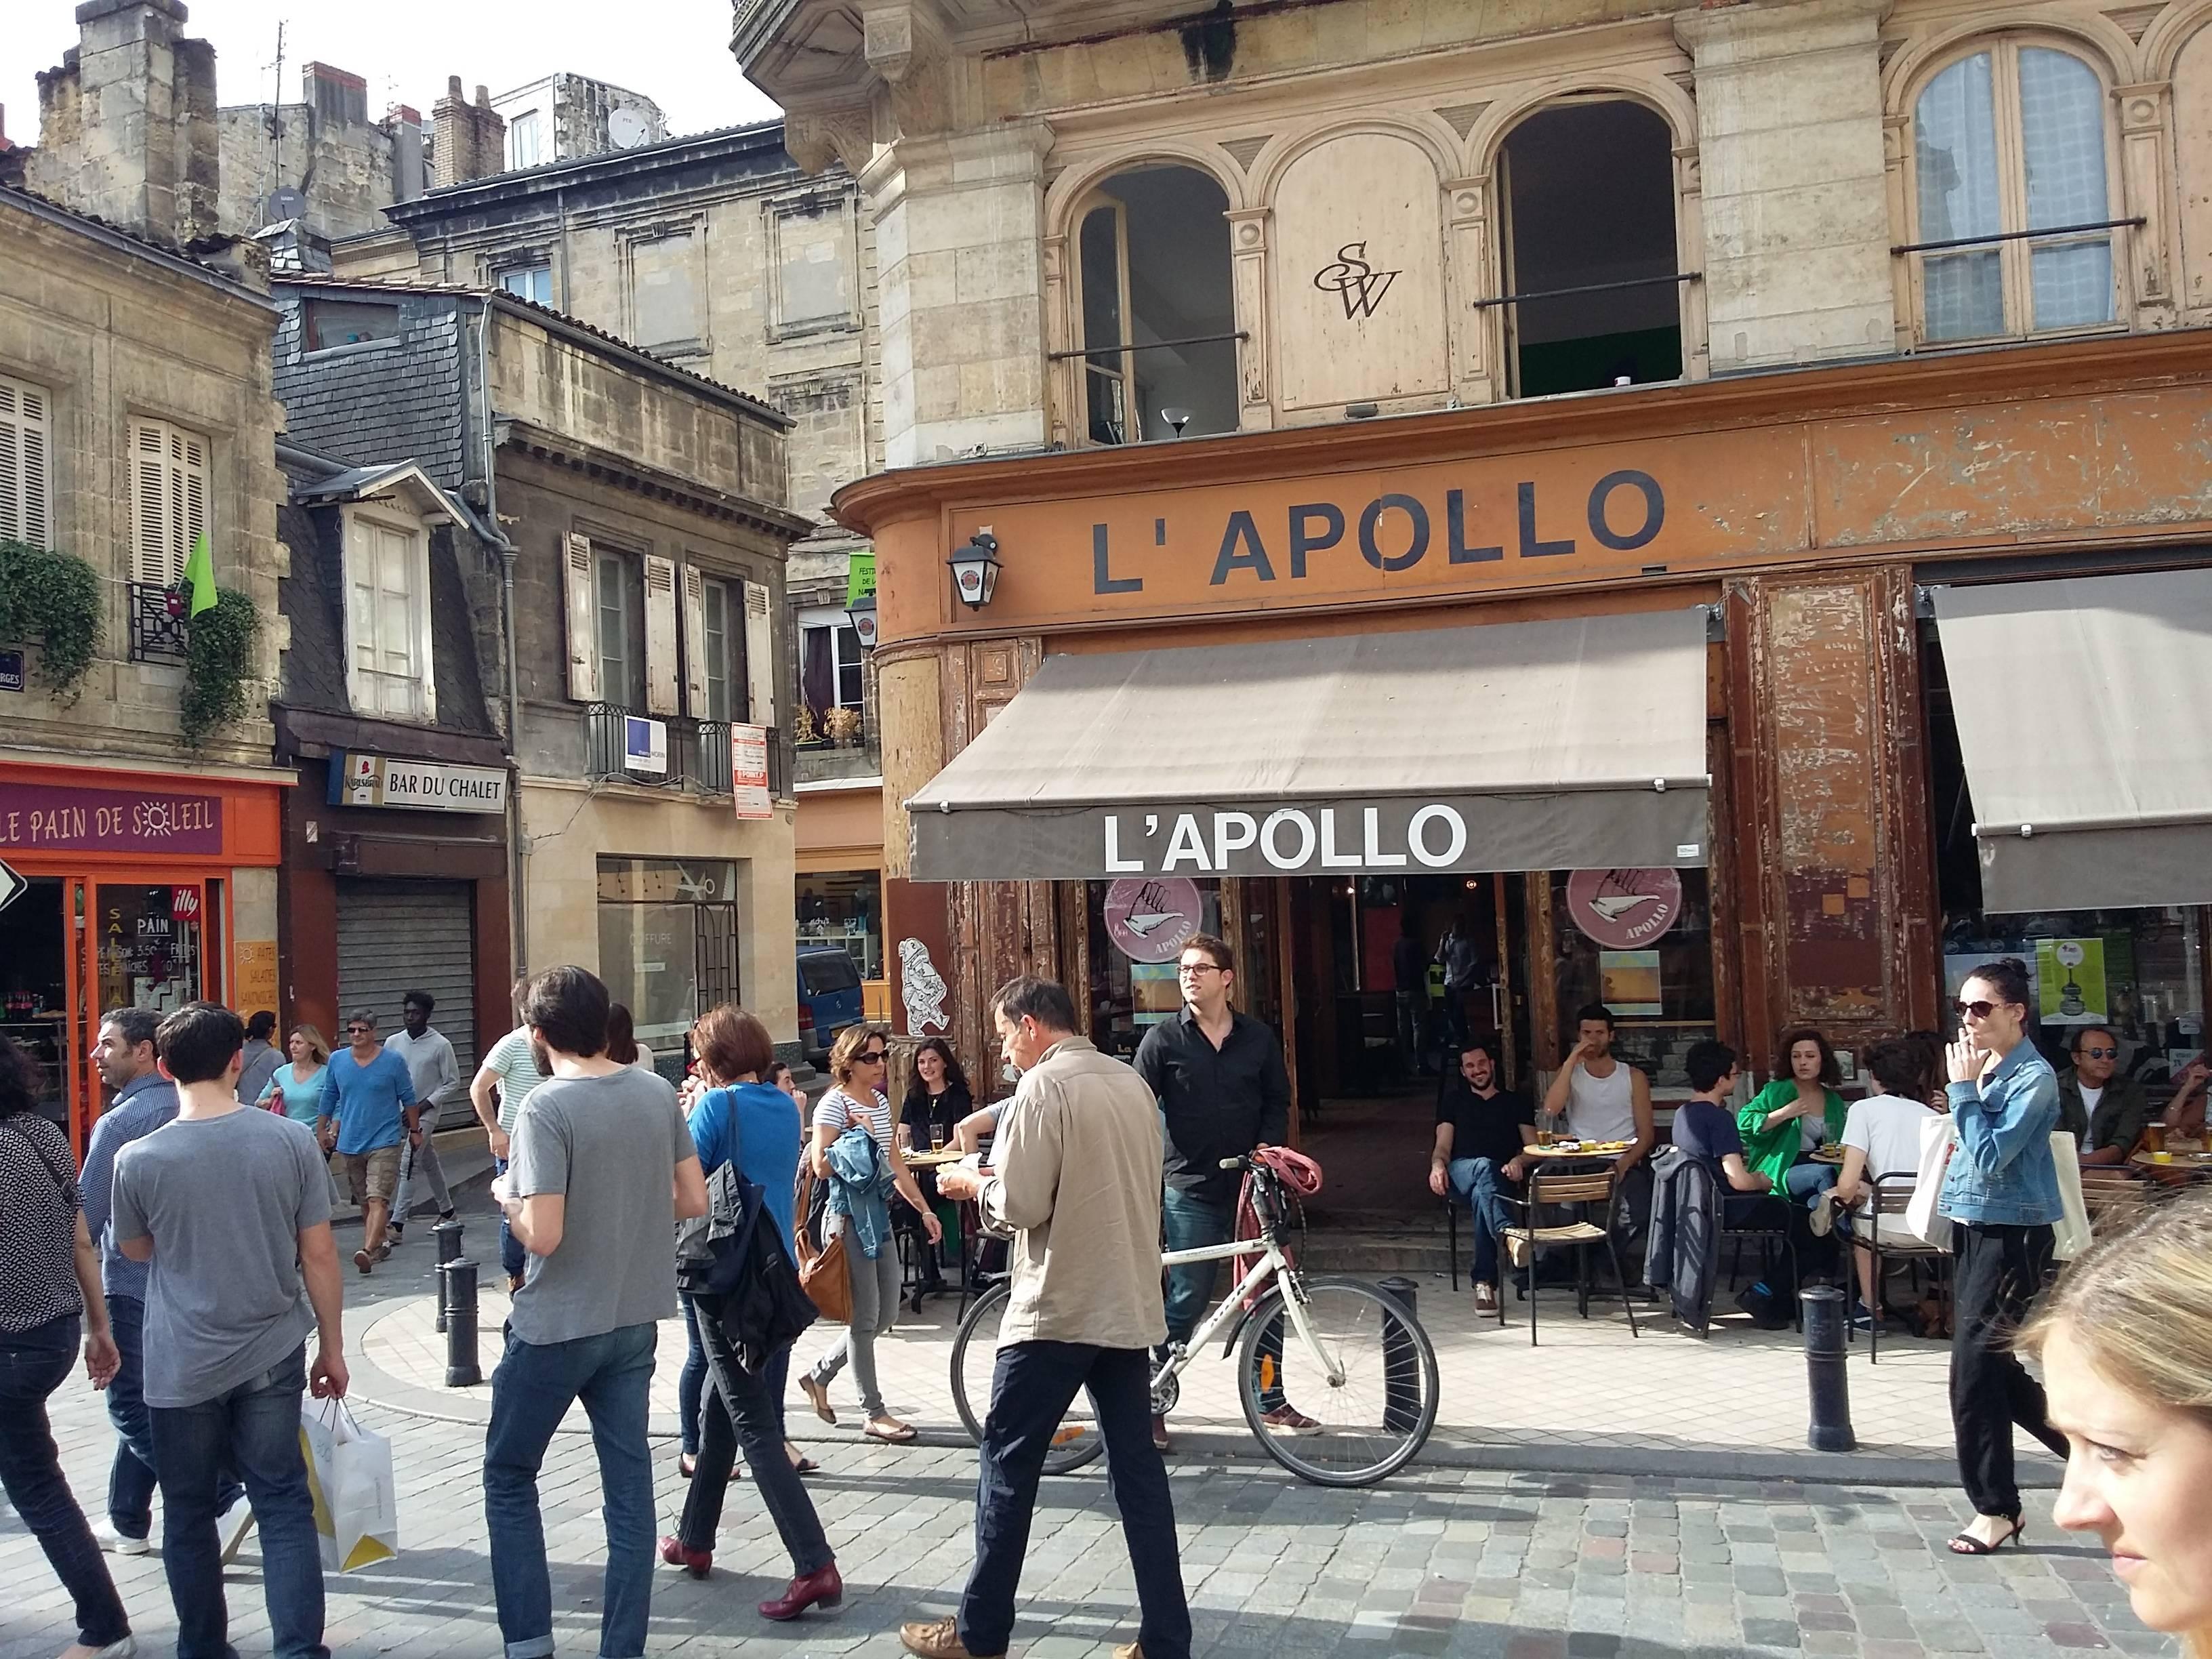 Photo 1: L'apollo, l'afterwork populaire